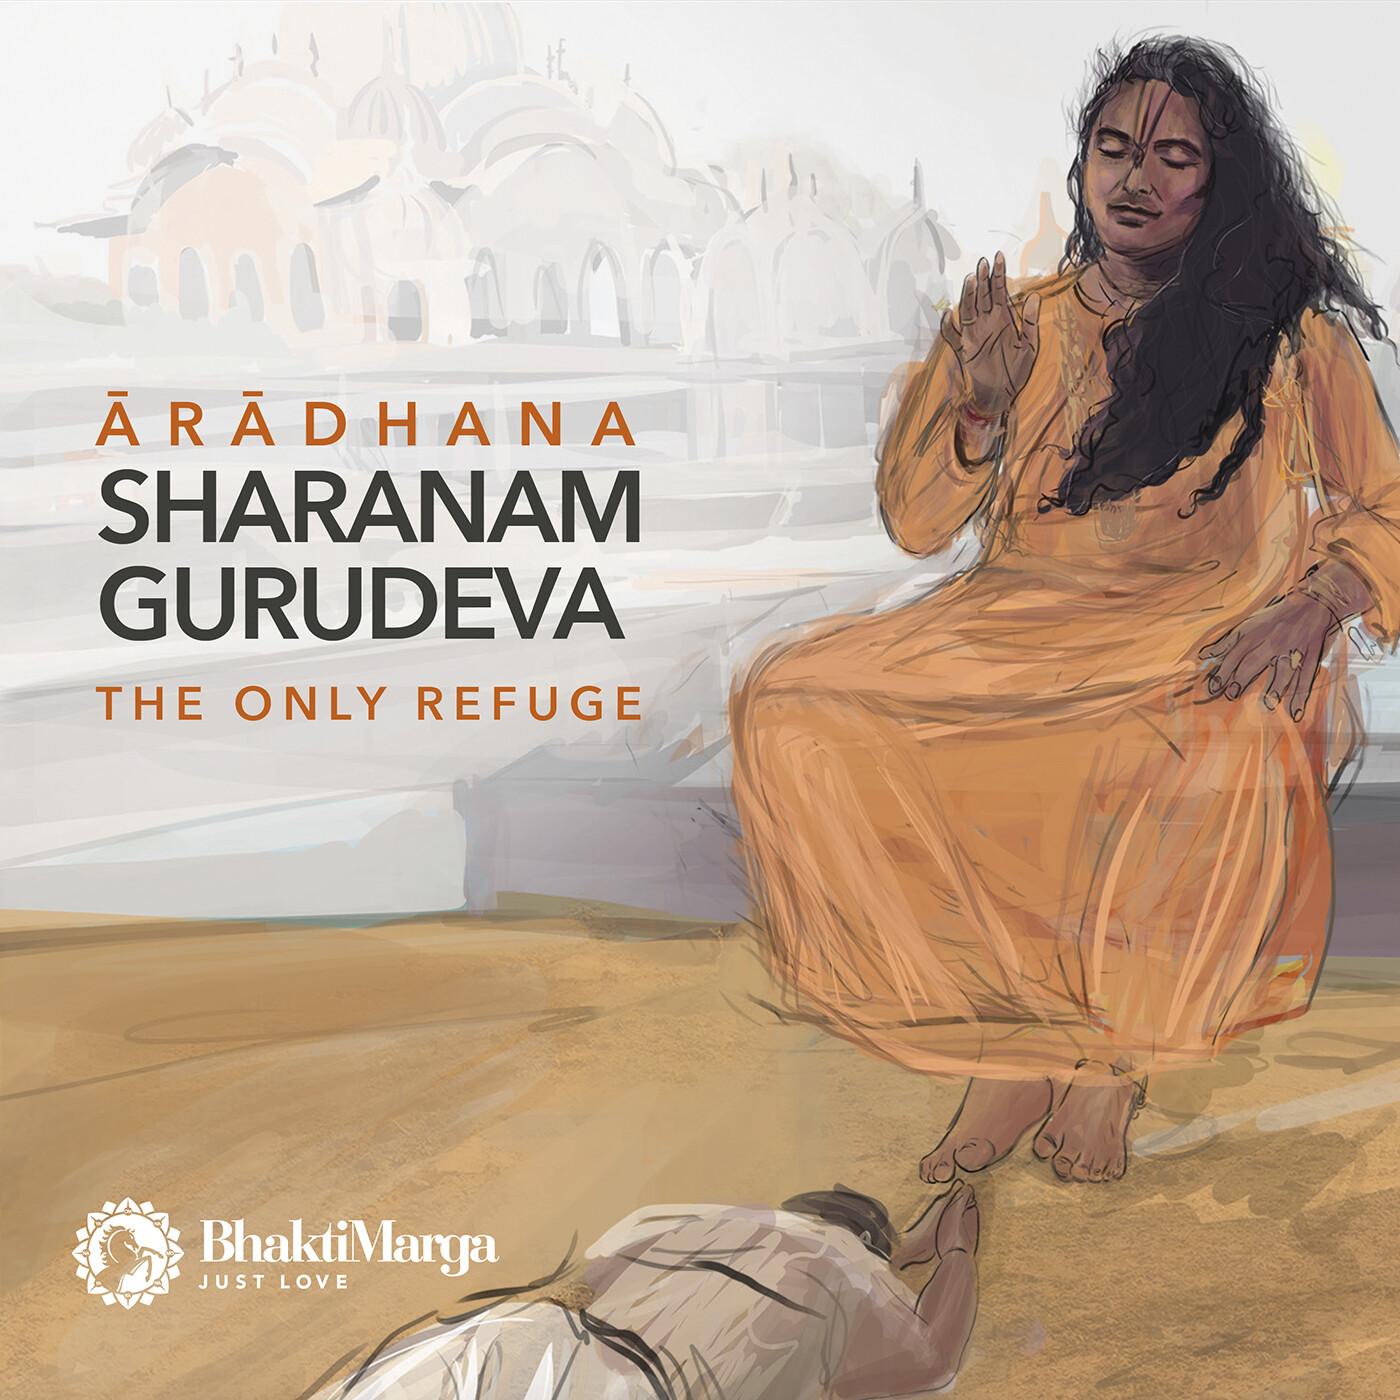 Aradhana: Sharanam Gurudeva